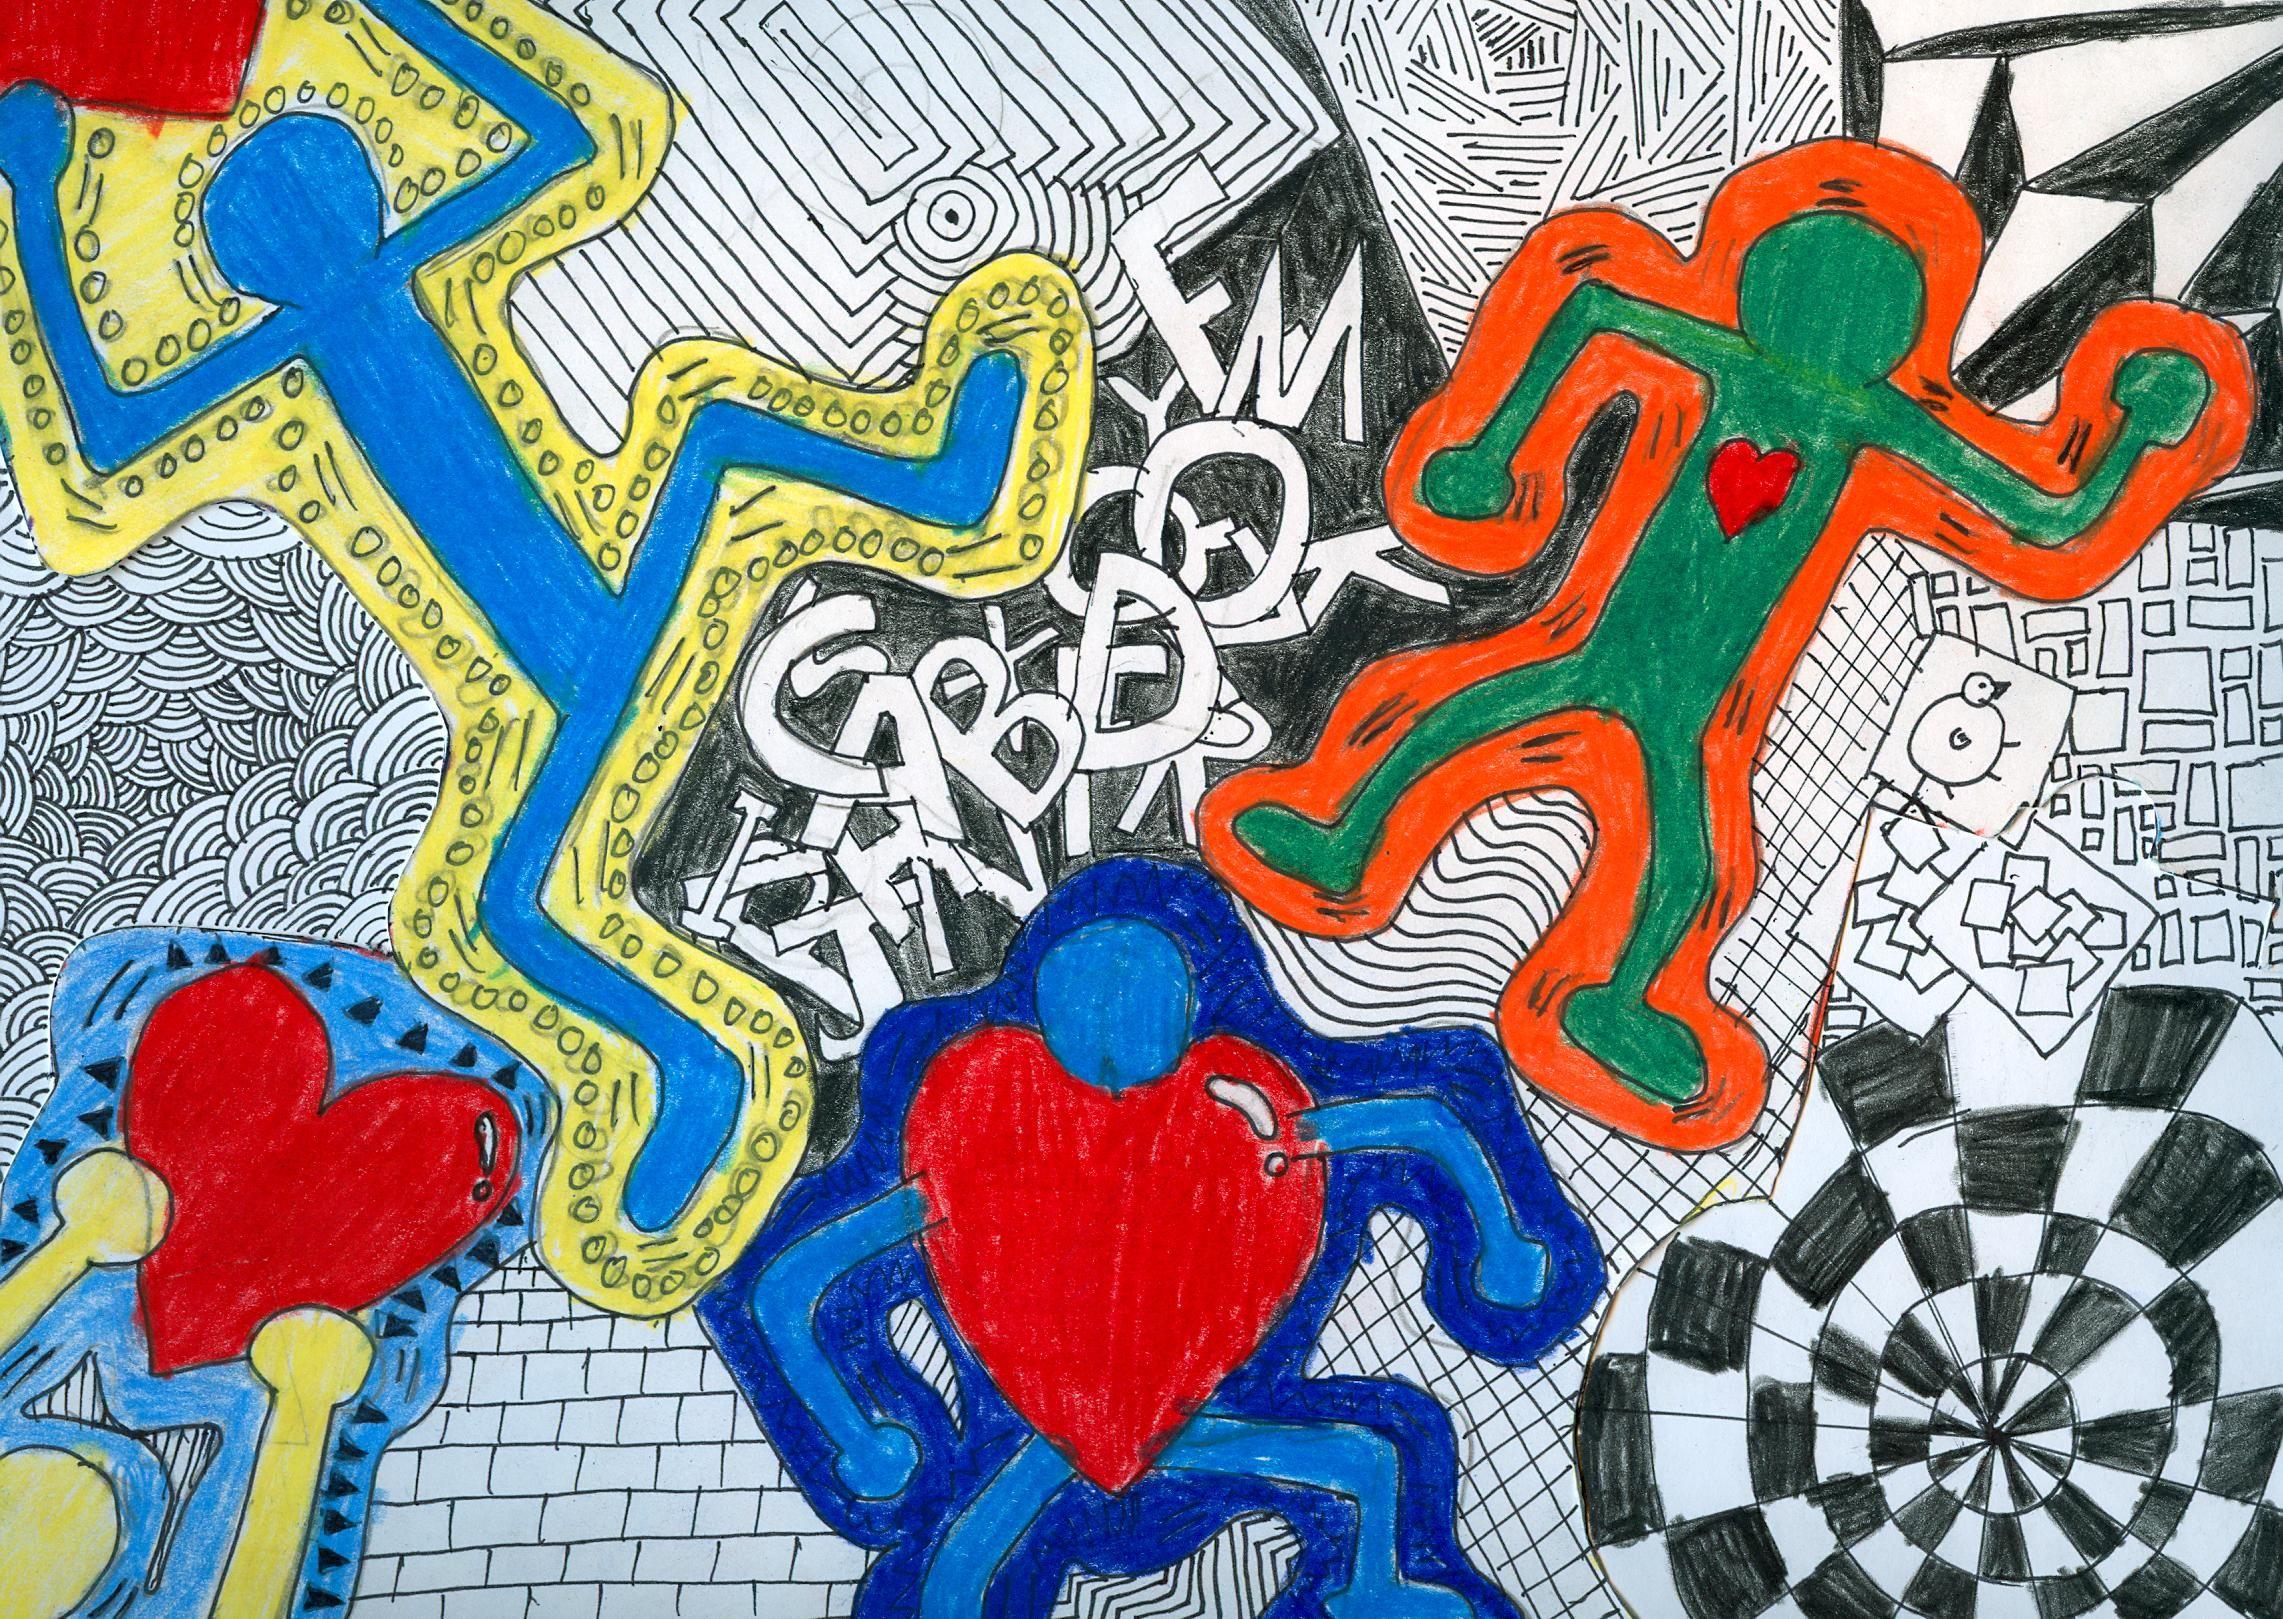 Albert S 7th Grade Keith Haring Inspired Drawing